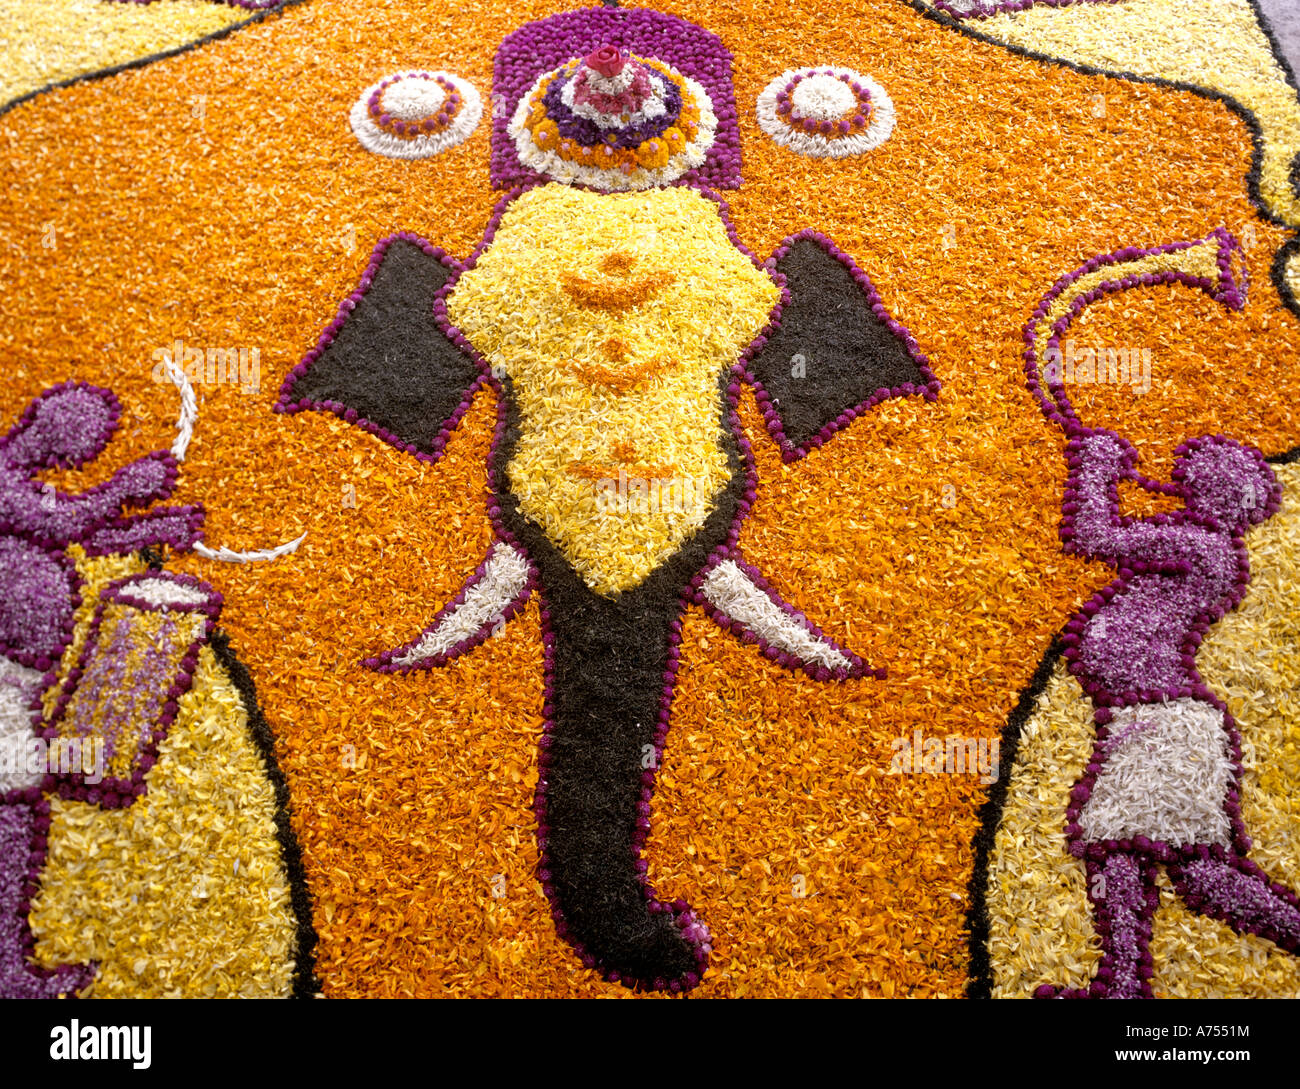 A FLOWER CARPET KERALA Stock Photo: 11727199